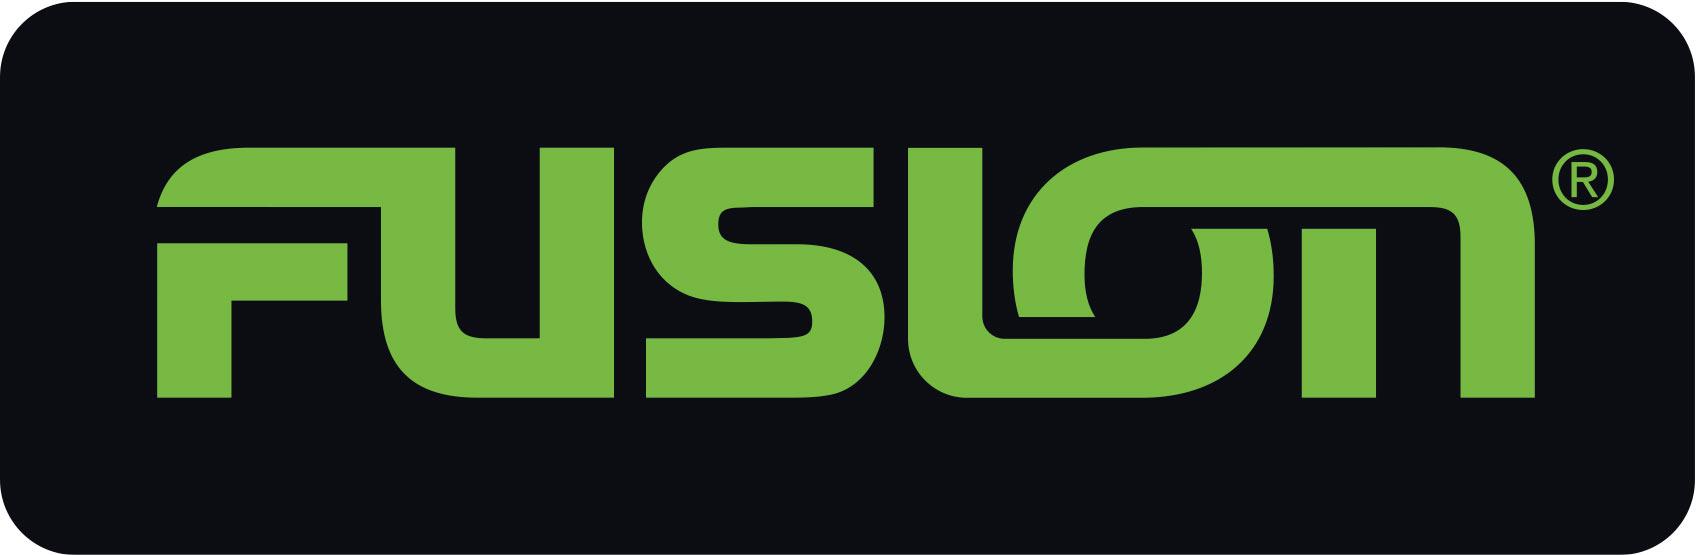 fusion_logo_m-2